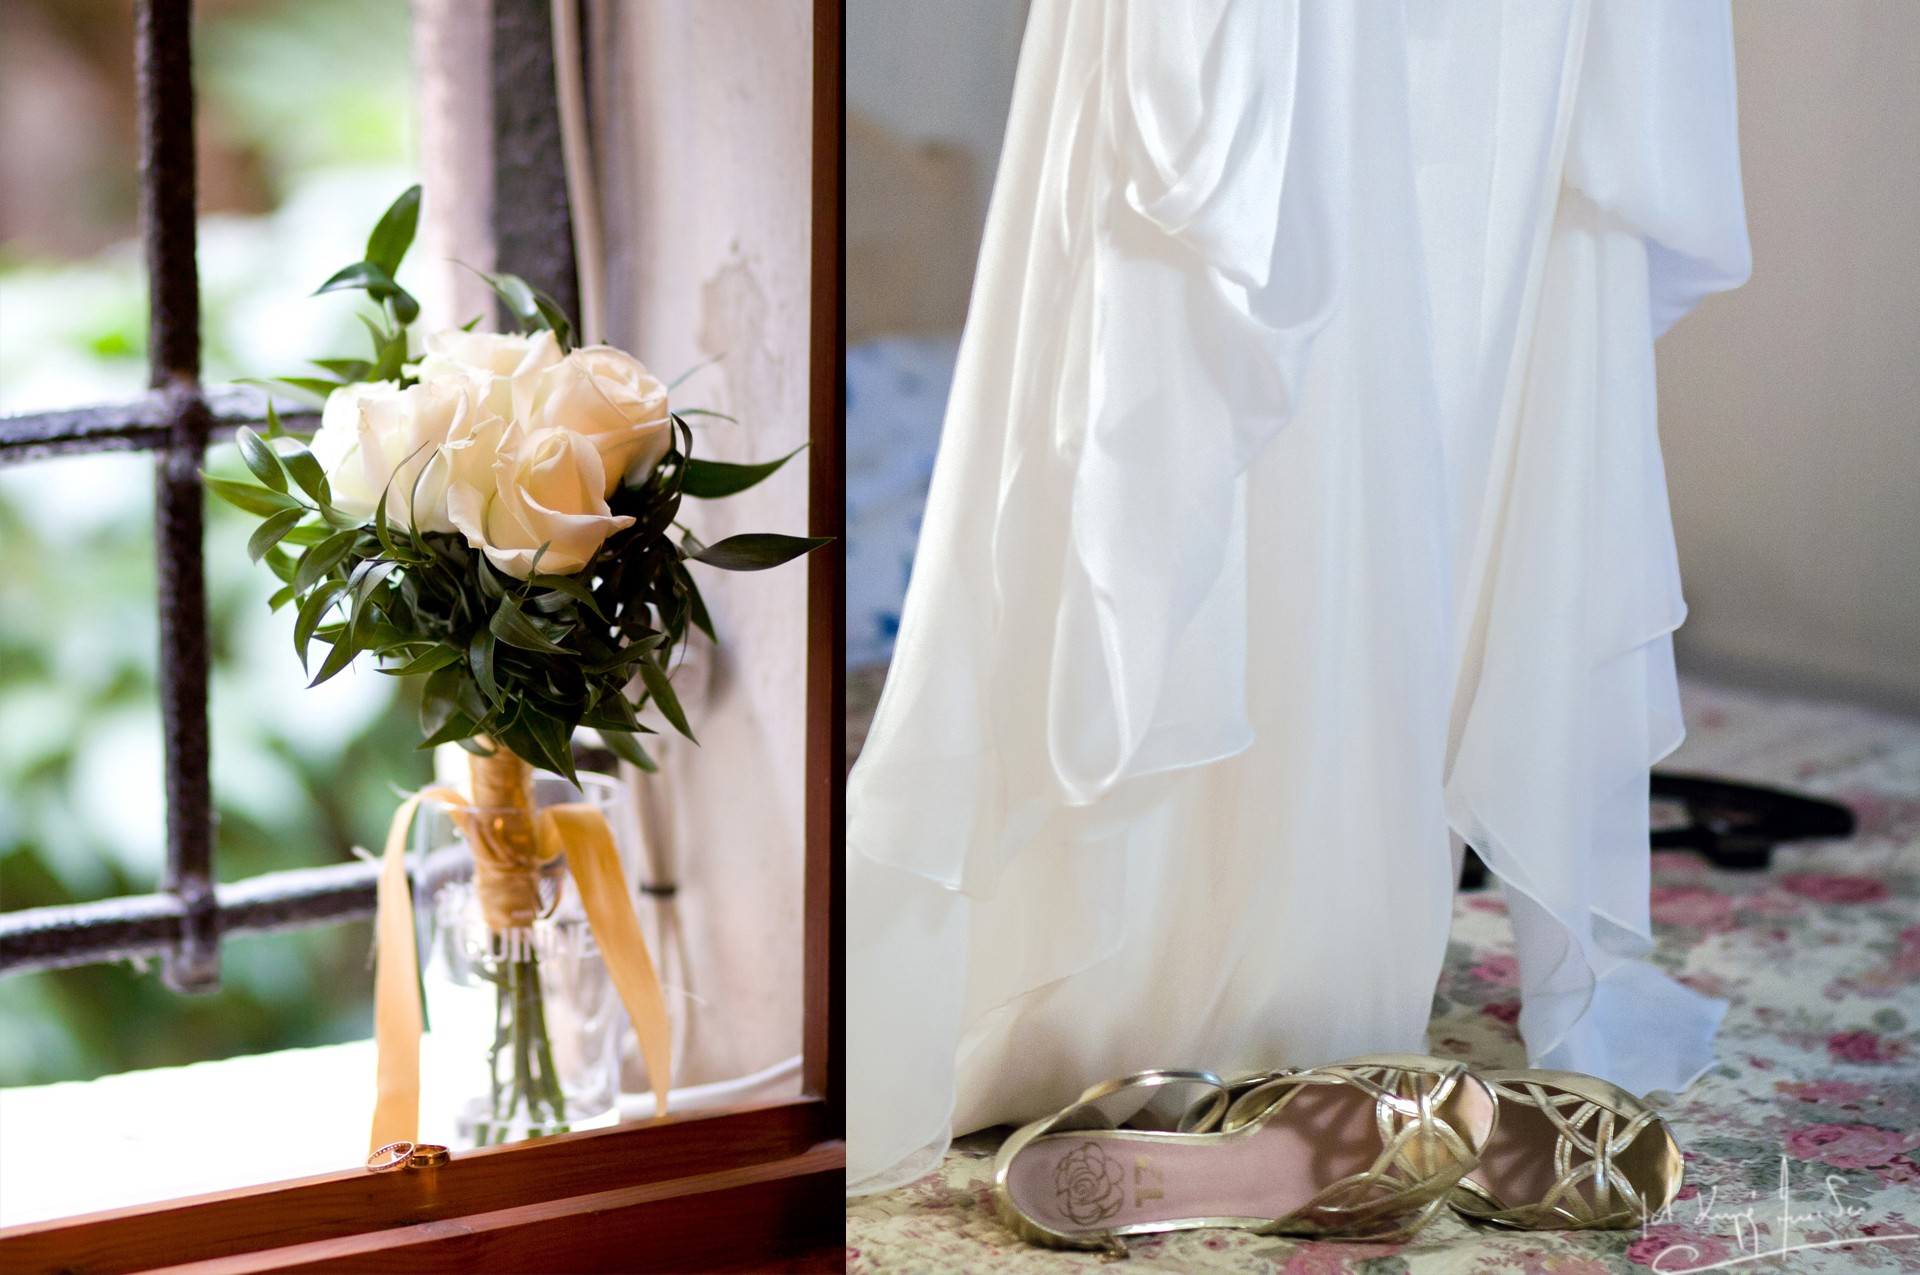 Ślub w wenecji 5 Manuela Luiza & Young Seon Song